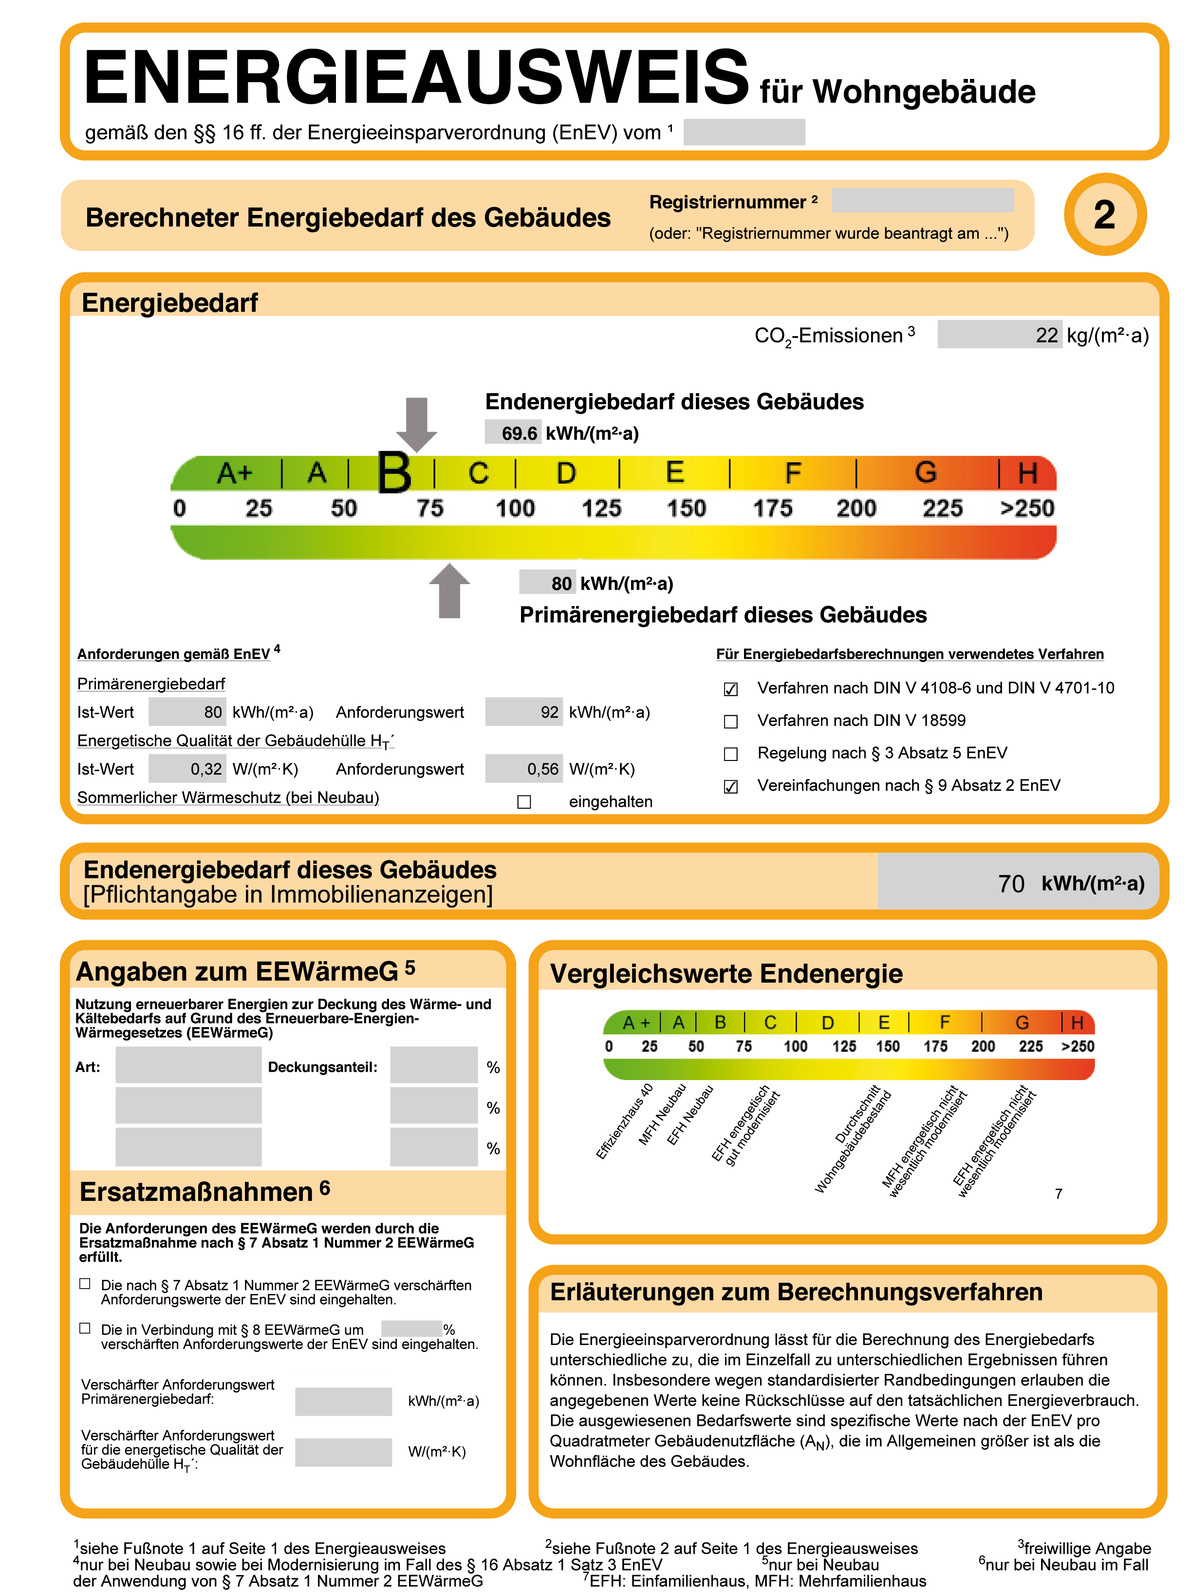 Energieagentur Nordbayern Energieausweis